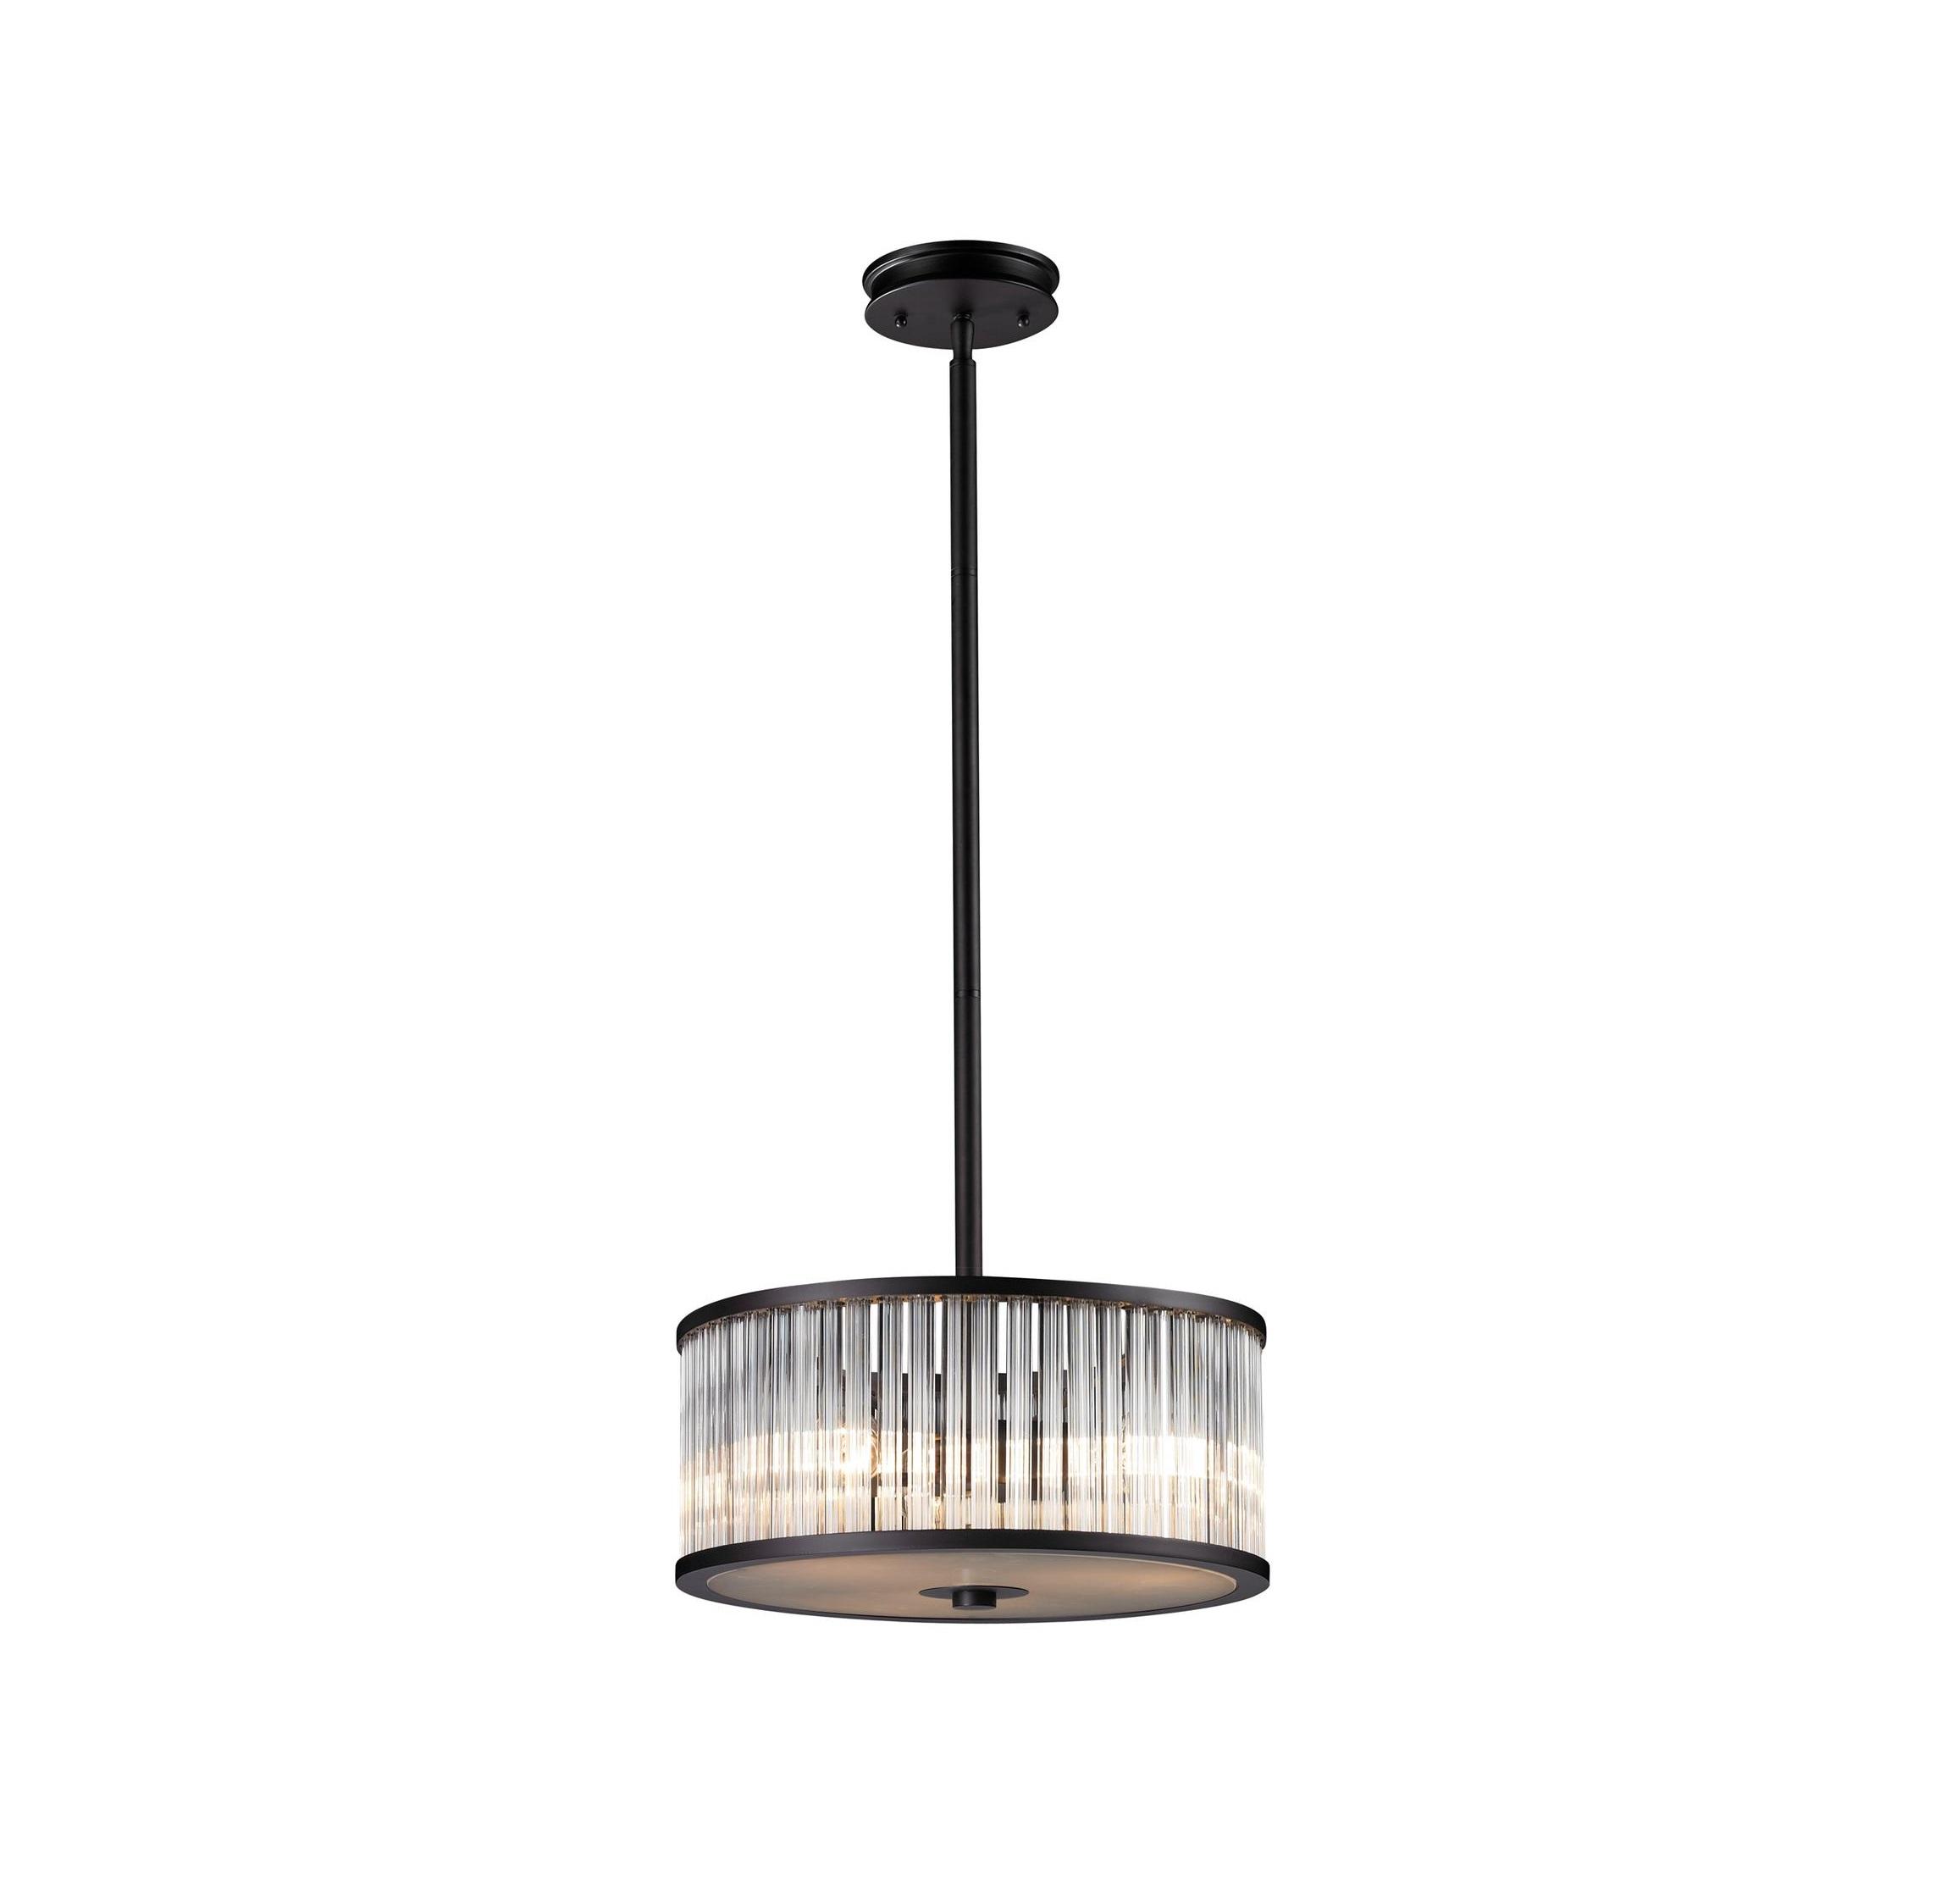 ELK Lighting Braxton 103283 Pendant Lights Brooklyn, New York by Accentuations Brand